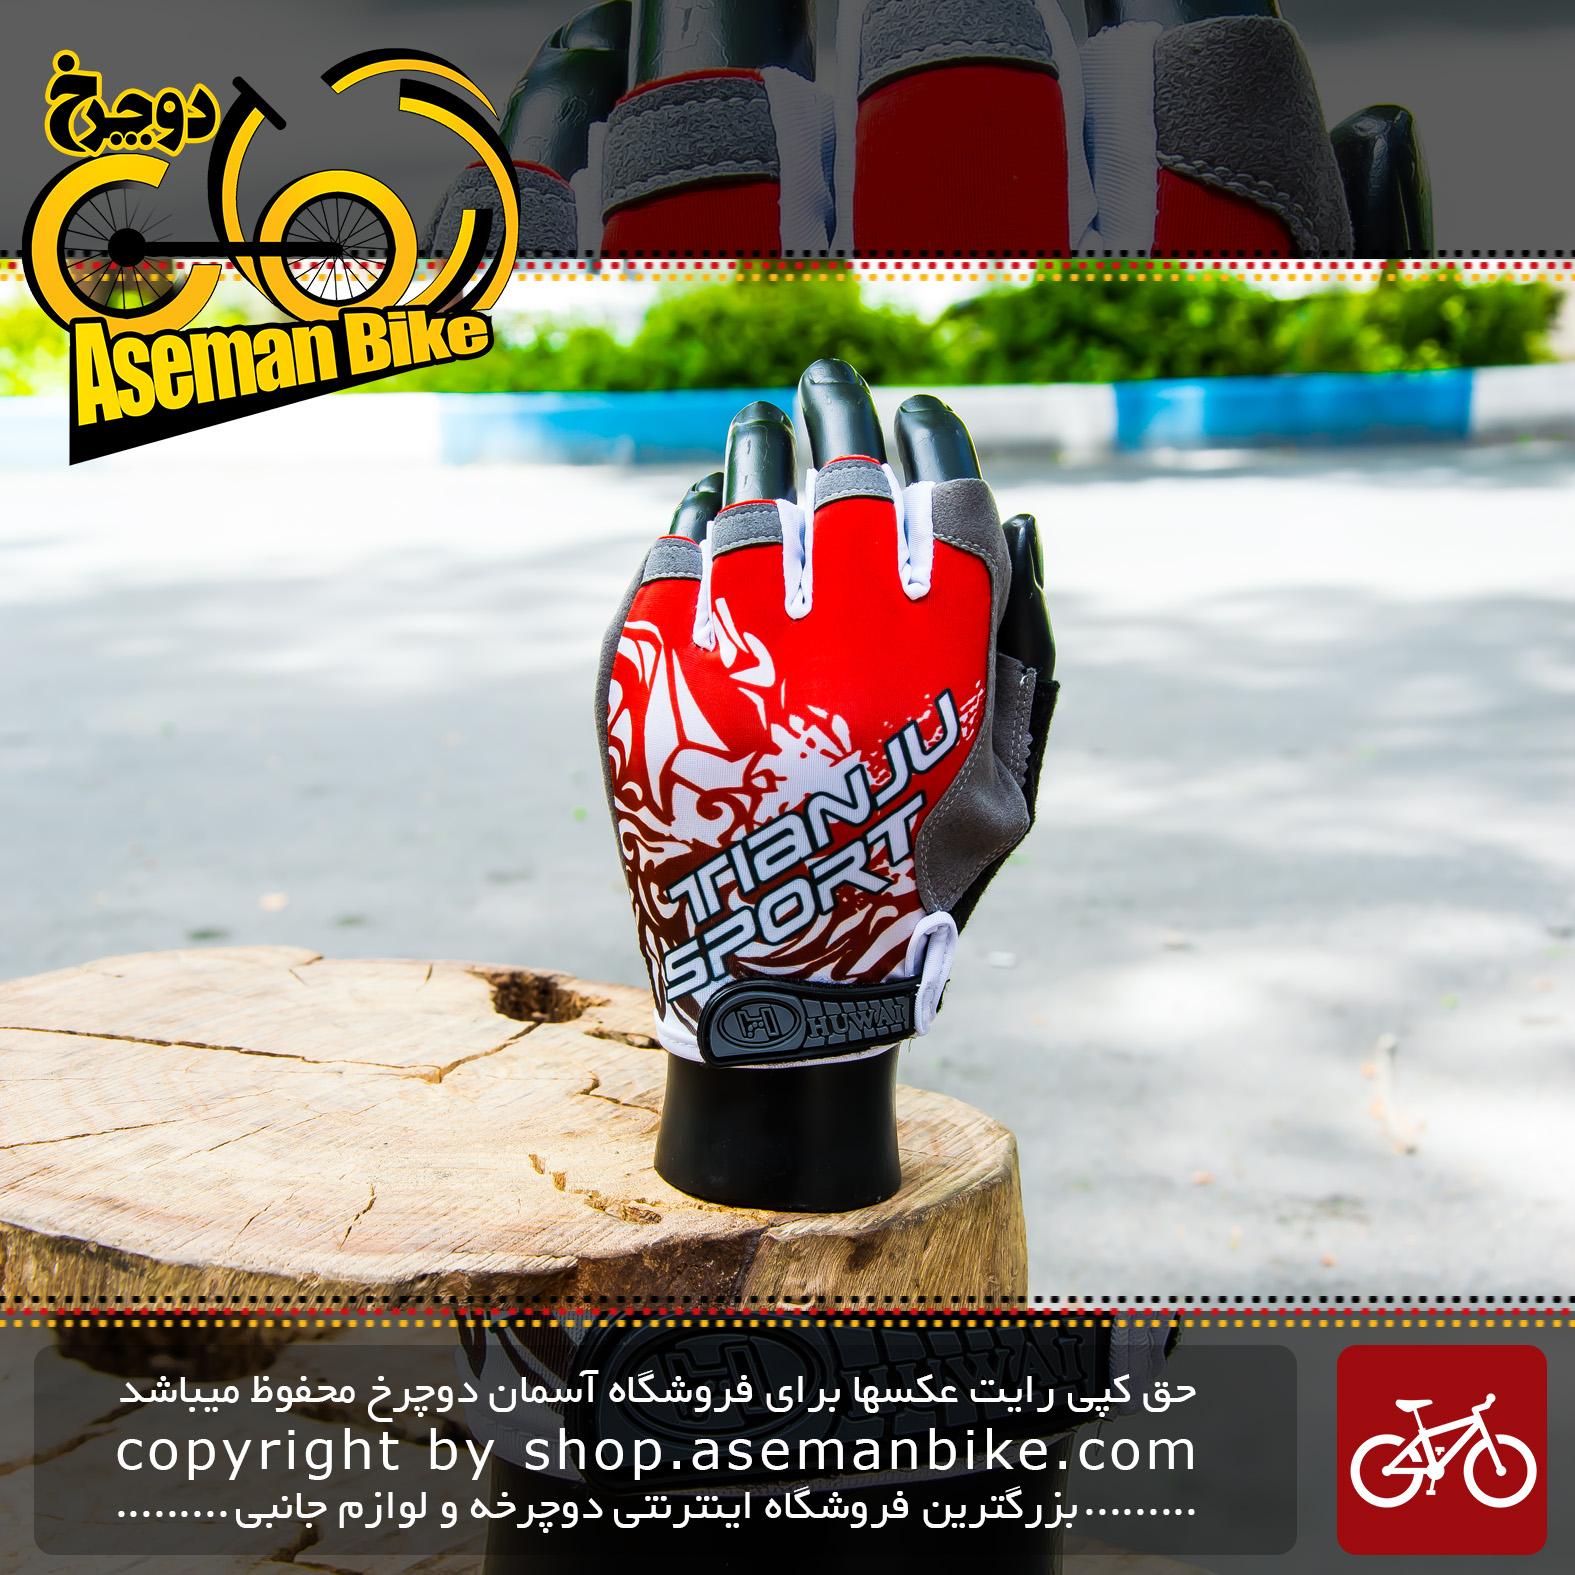 دستکش دوچرخه سواری مدل تیانجو ژله ای اسپرت Gloves Bicycle Tianju Gel Sport Red